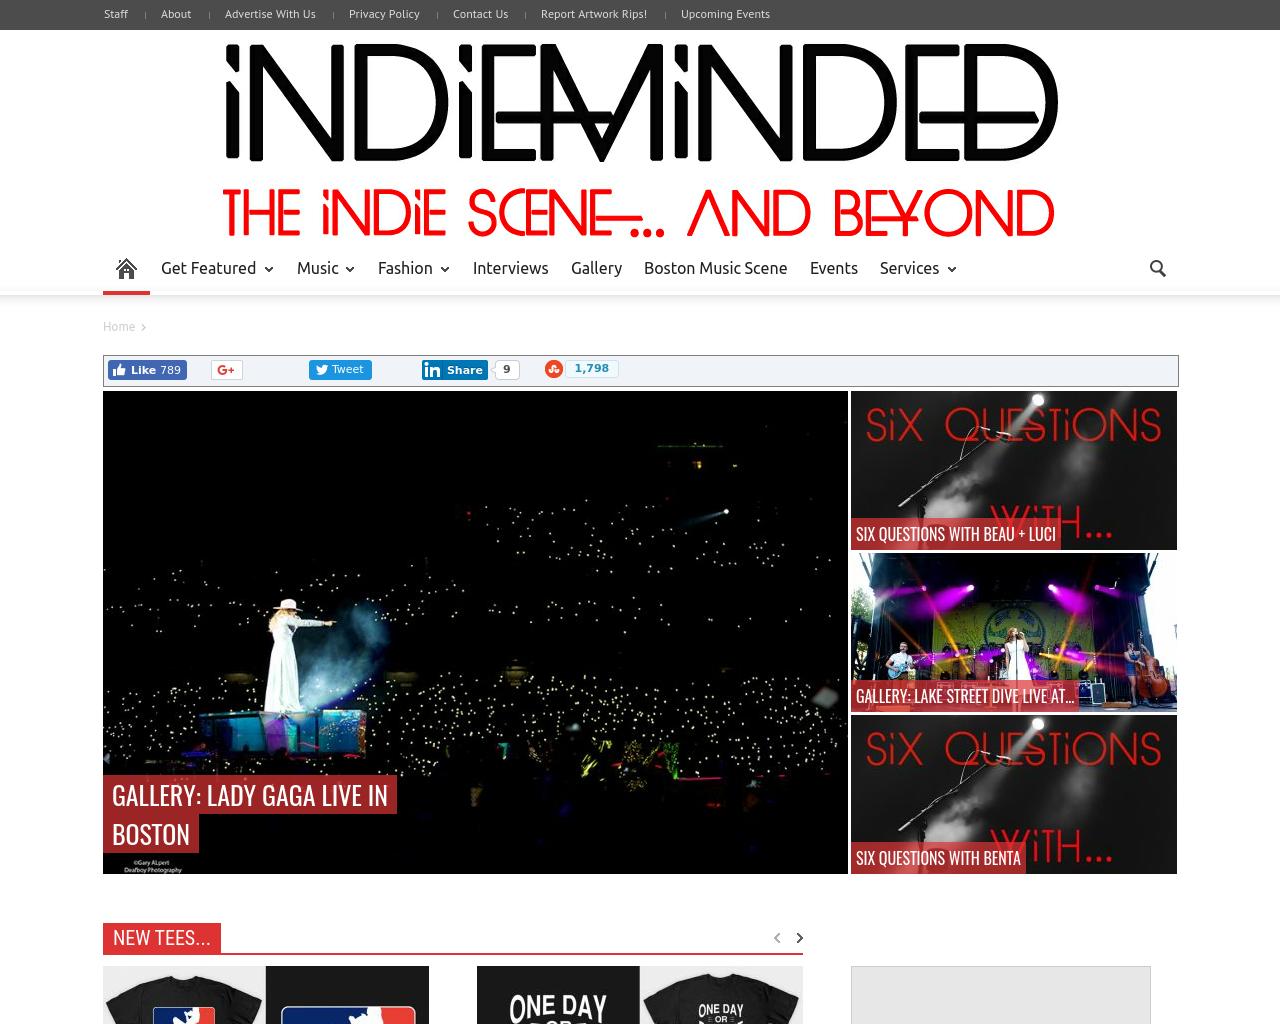 Indieminded-Advertising-Reviews-Pricing